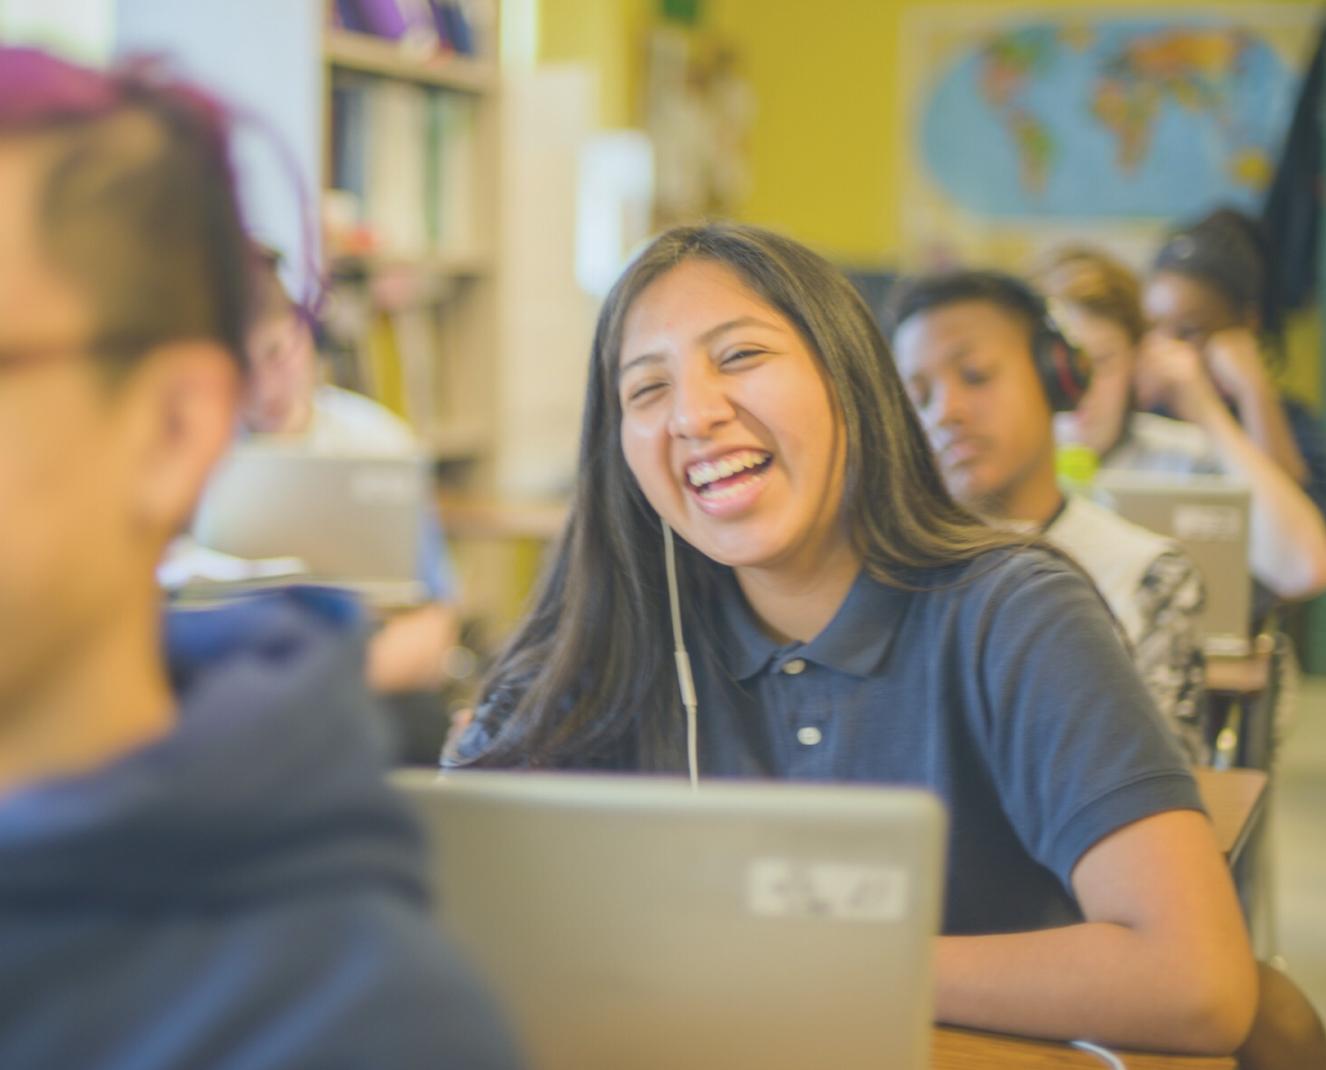 Teen girl laughing in class